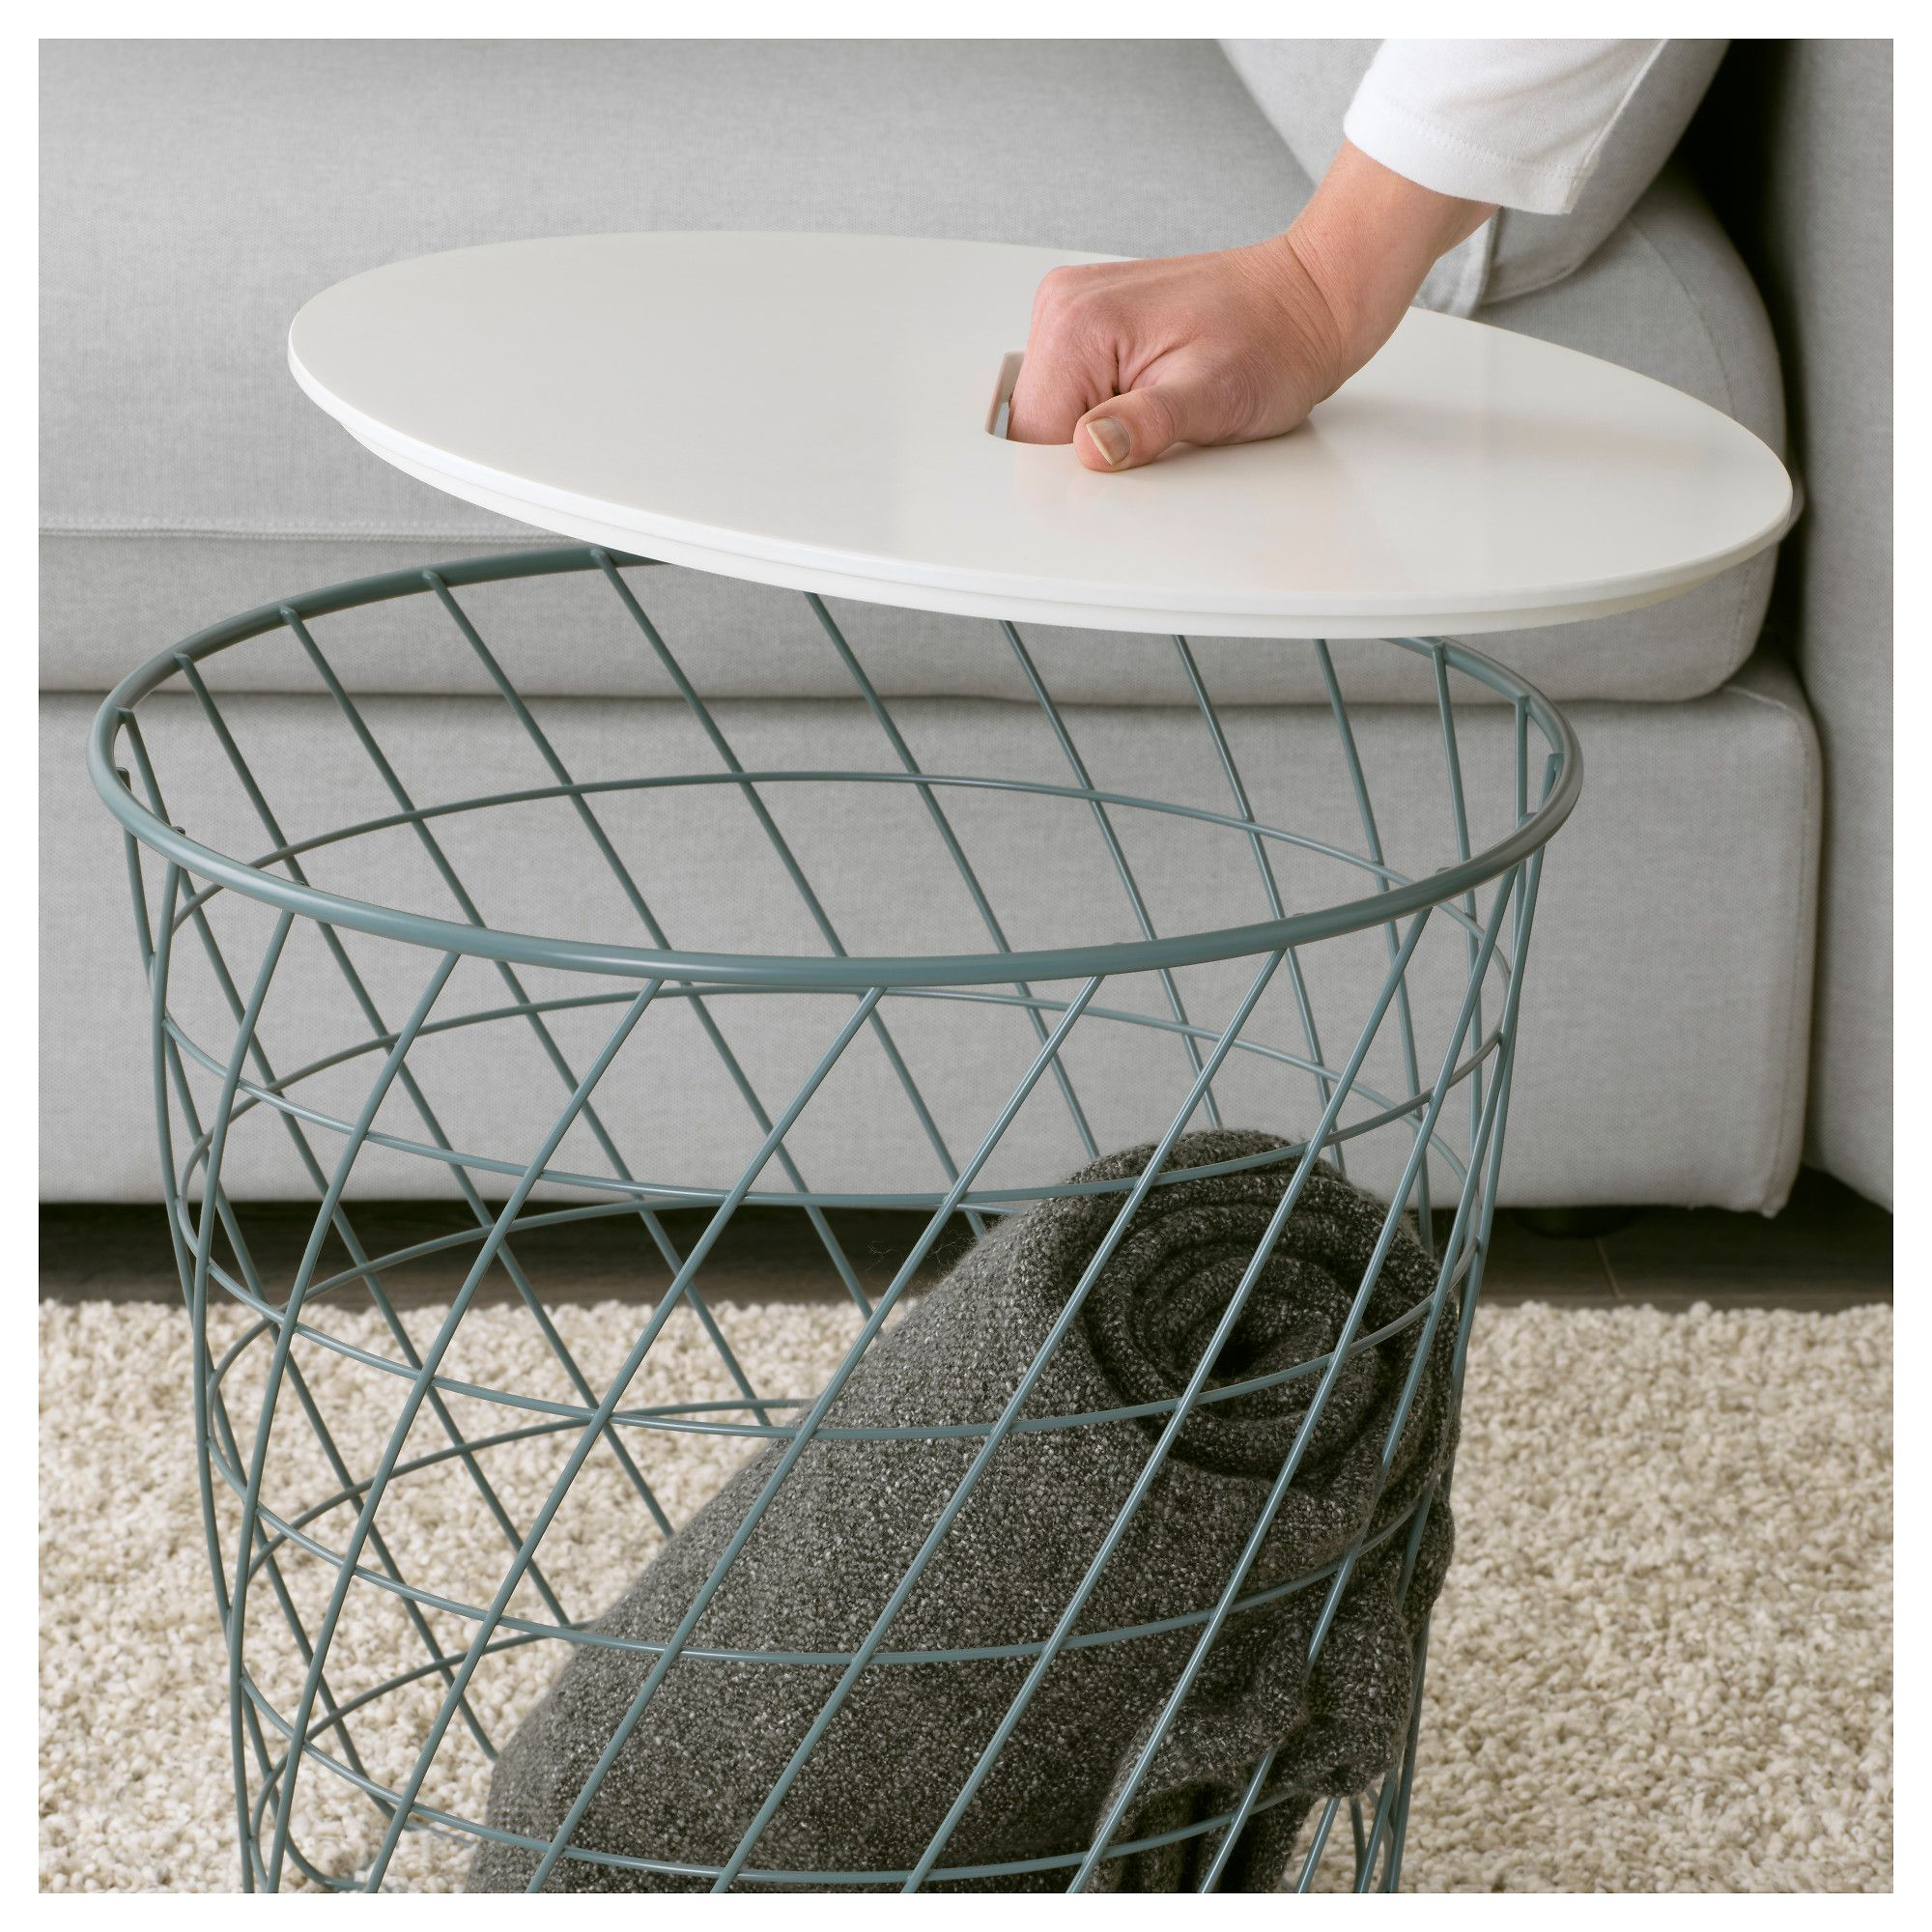 KVISTBRO τραπέζι με αποθηκευτικό χώρο IKEA